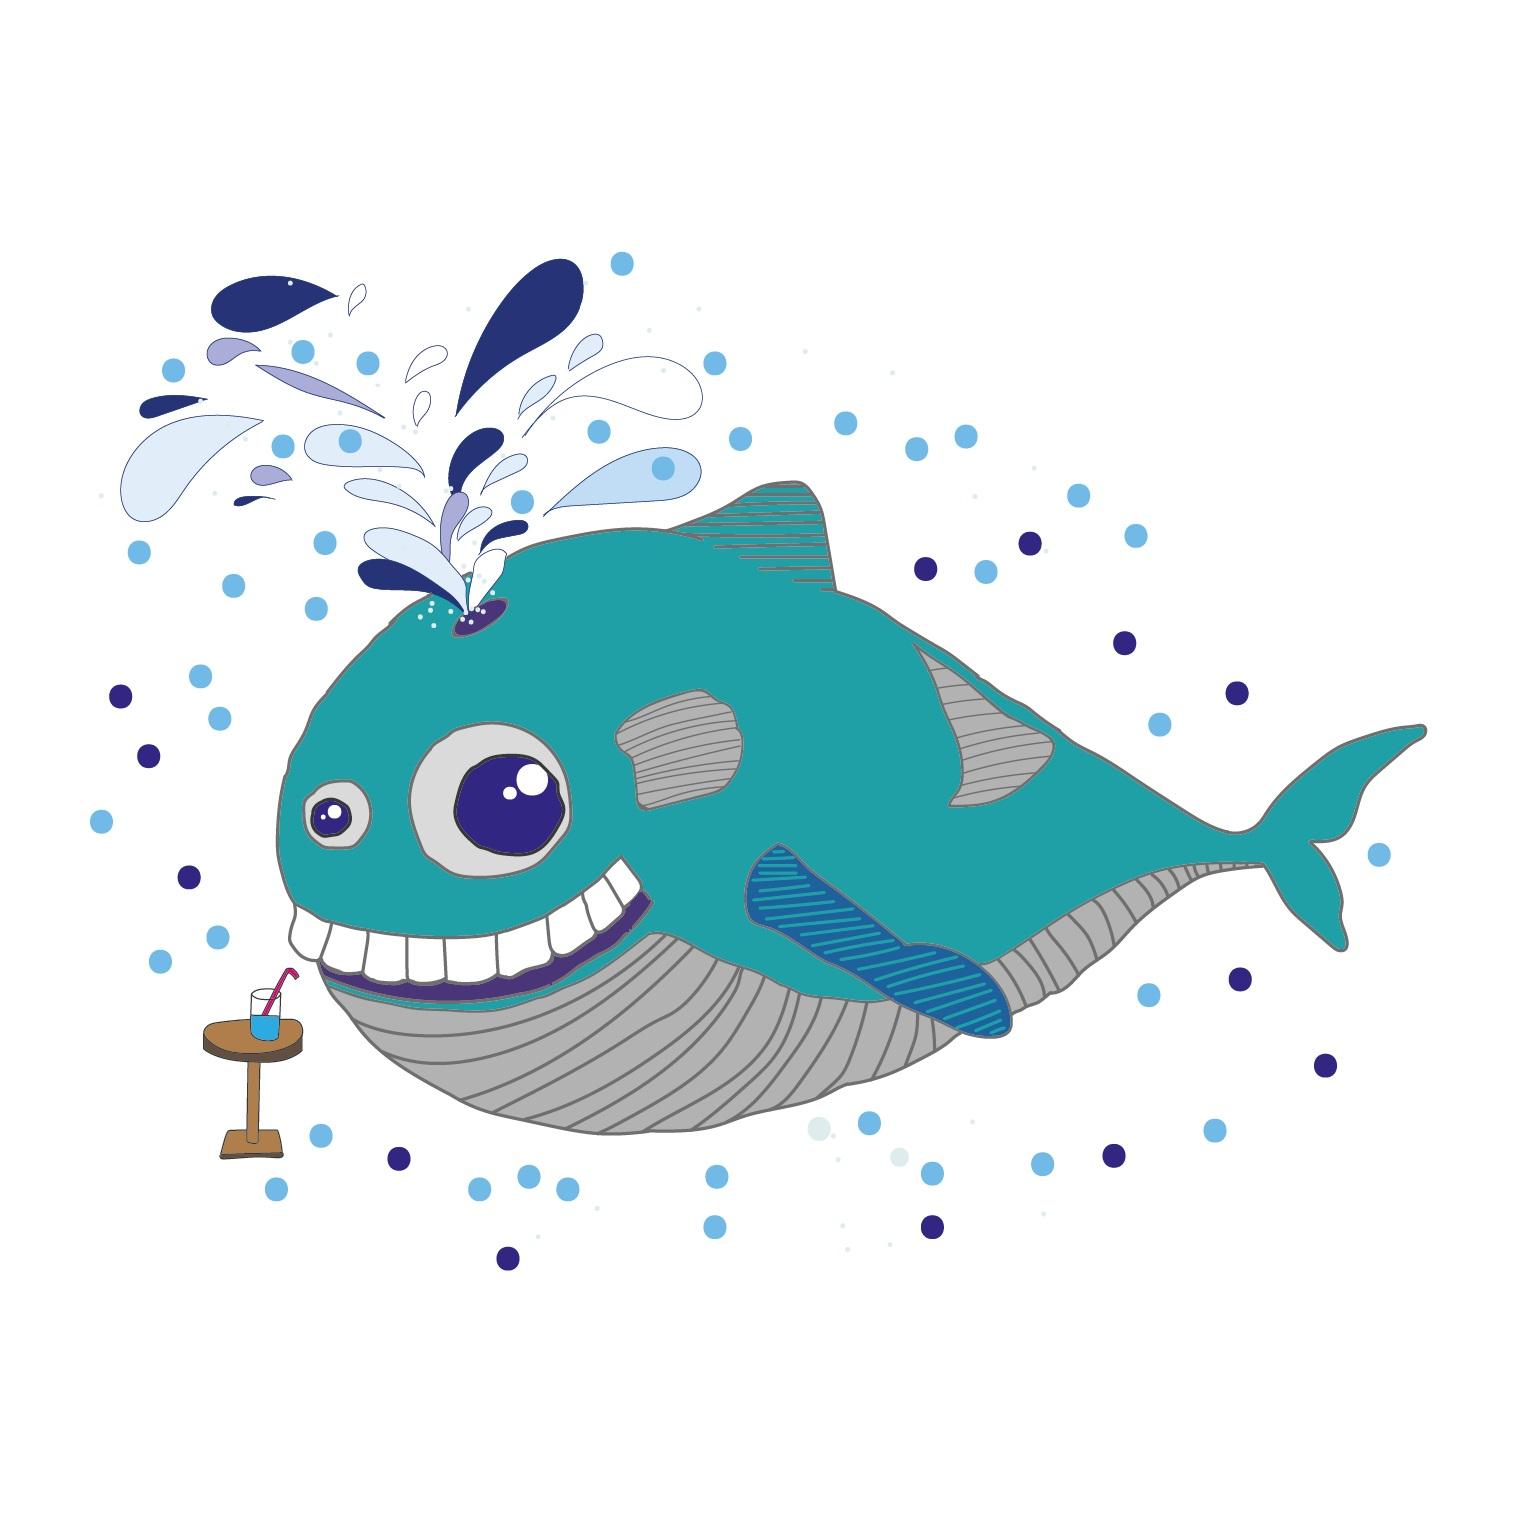 Hugo the Whale  2016 Digital illustration 1190 px x 840 px  More information